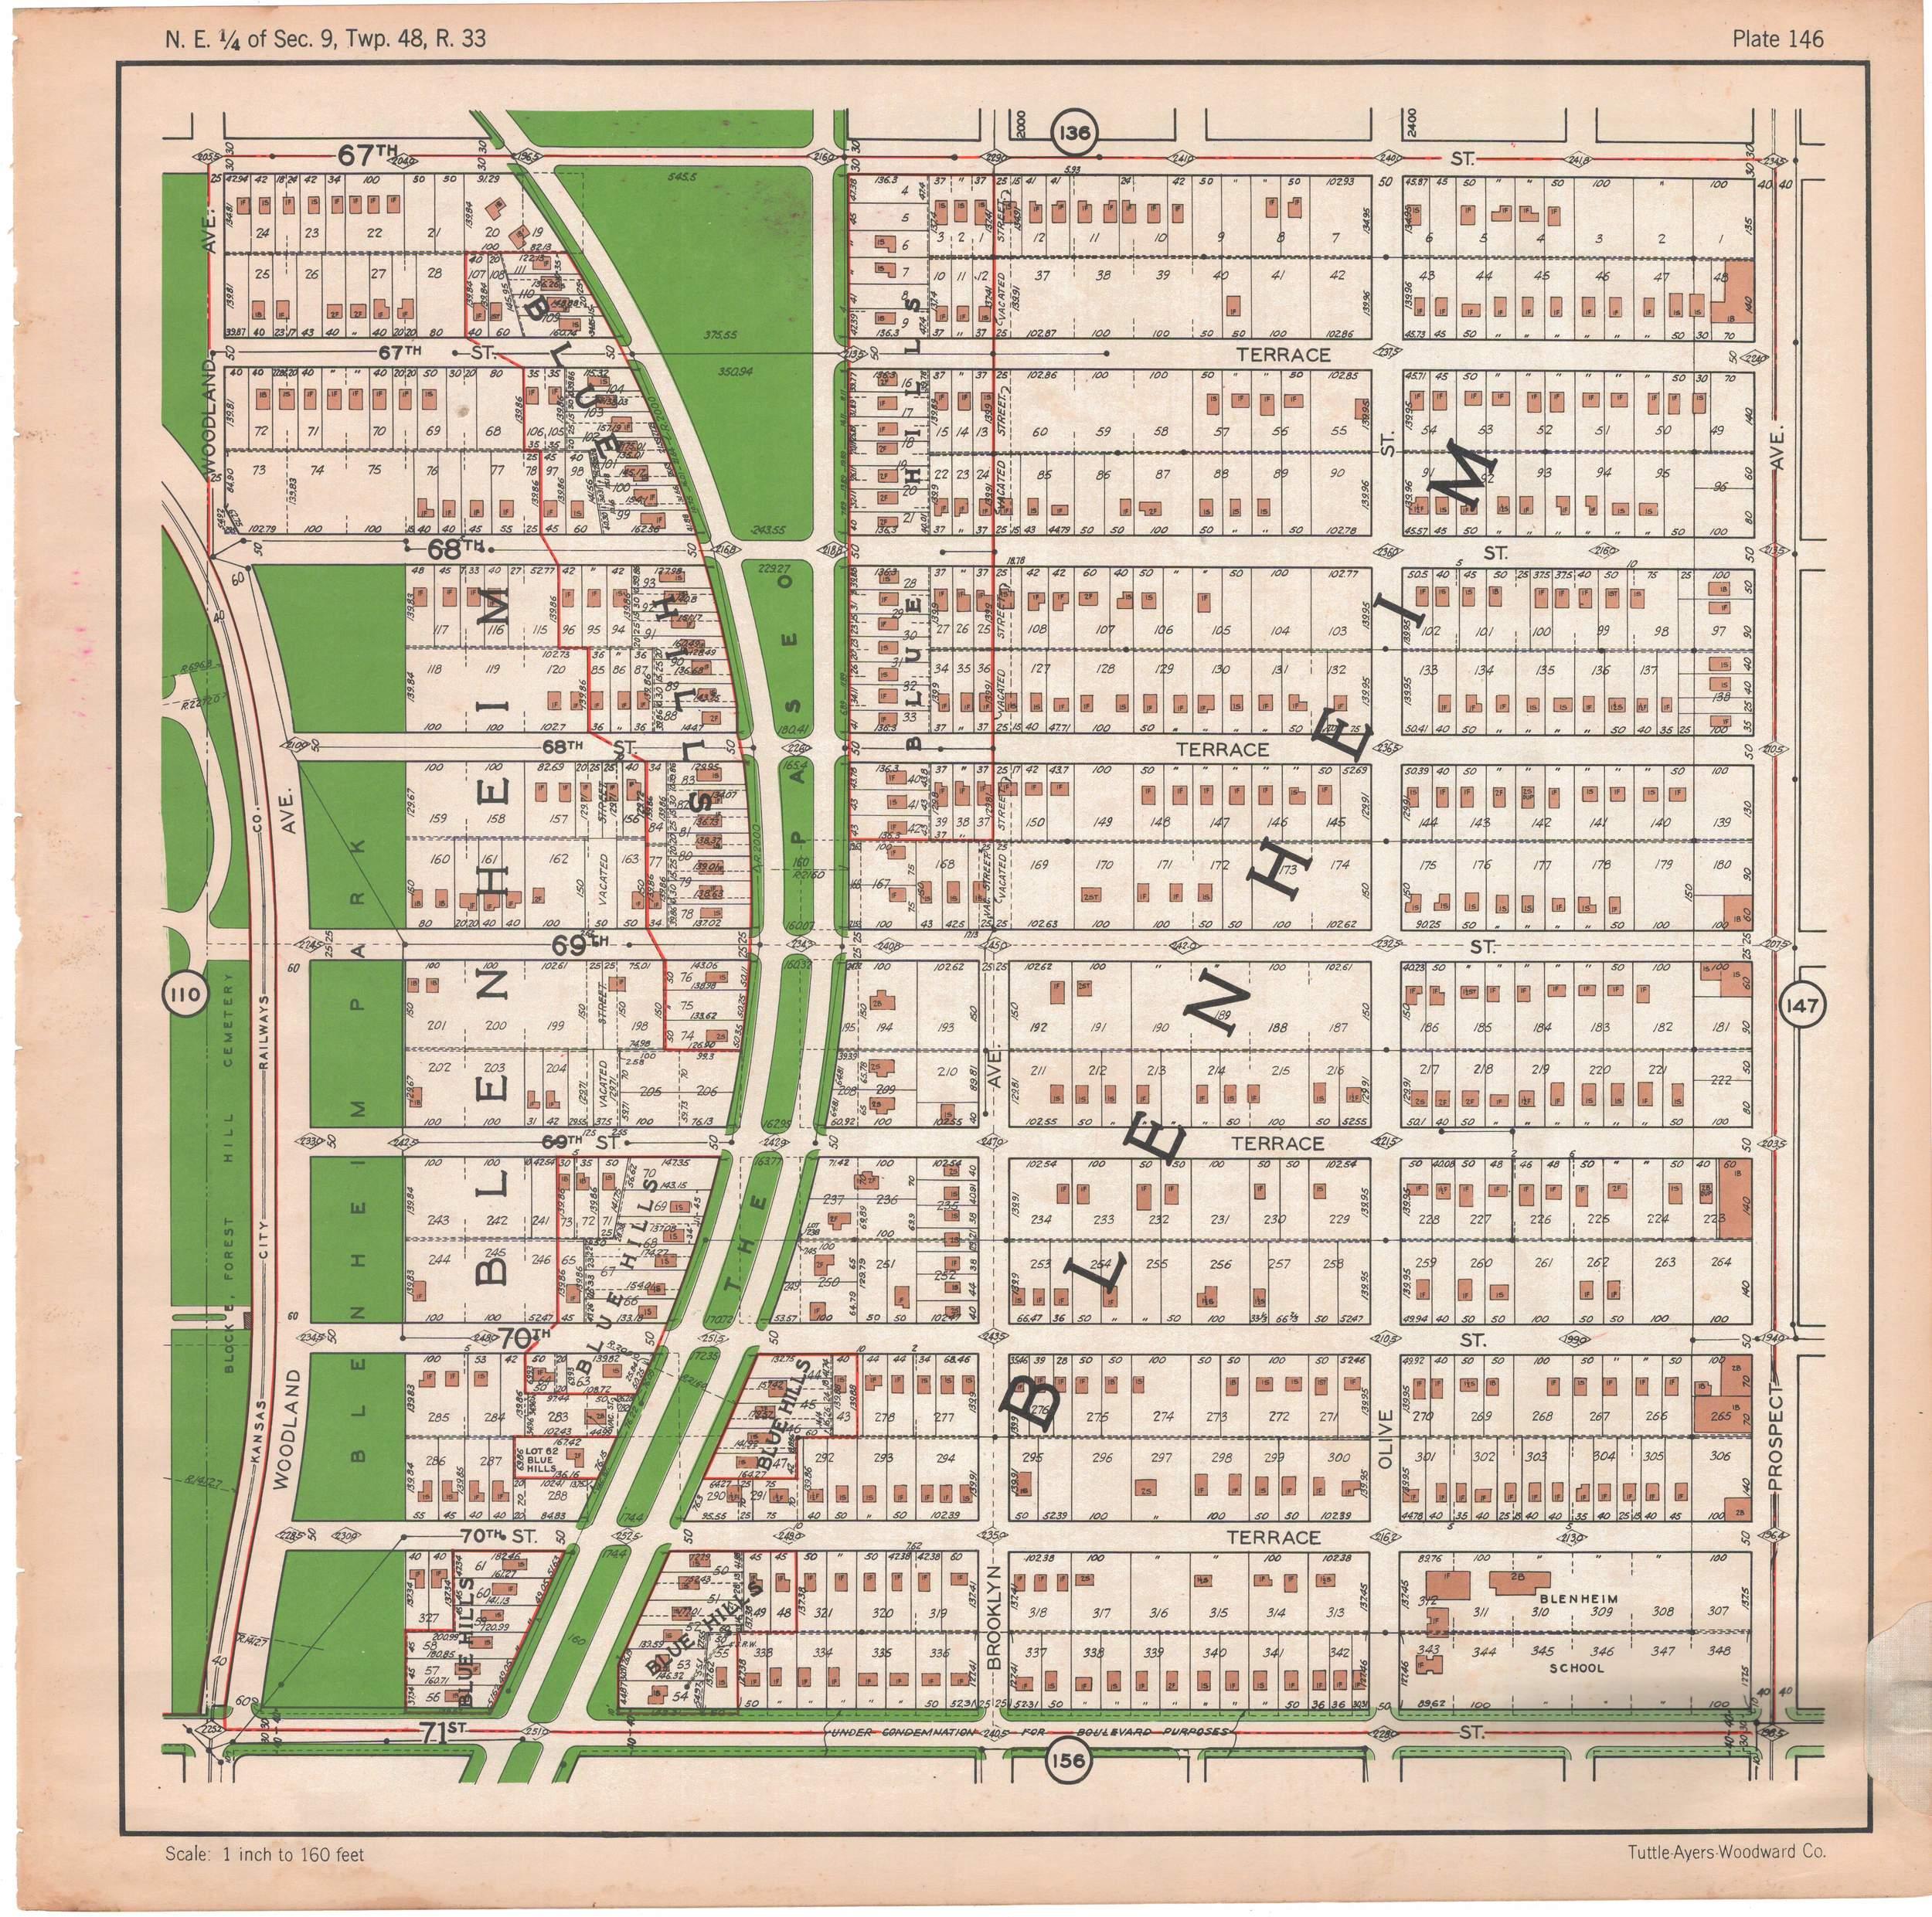 1925 TUTTLE_AYERS_Plate_146.JPG